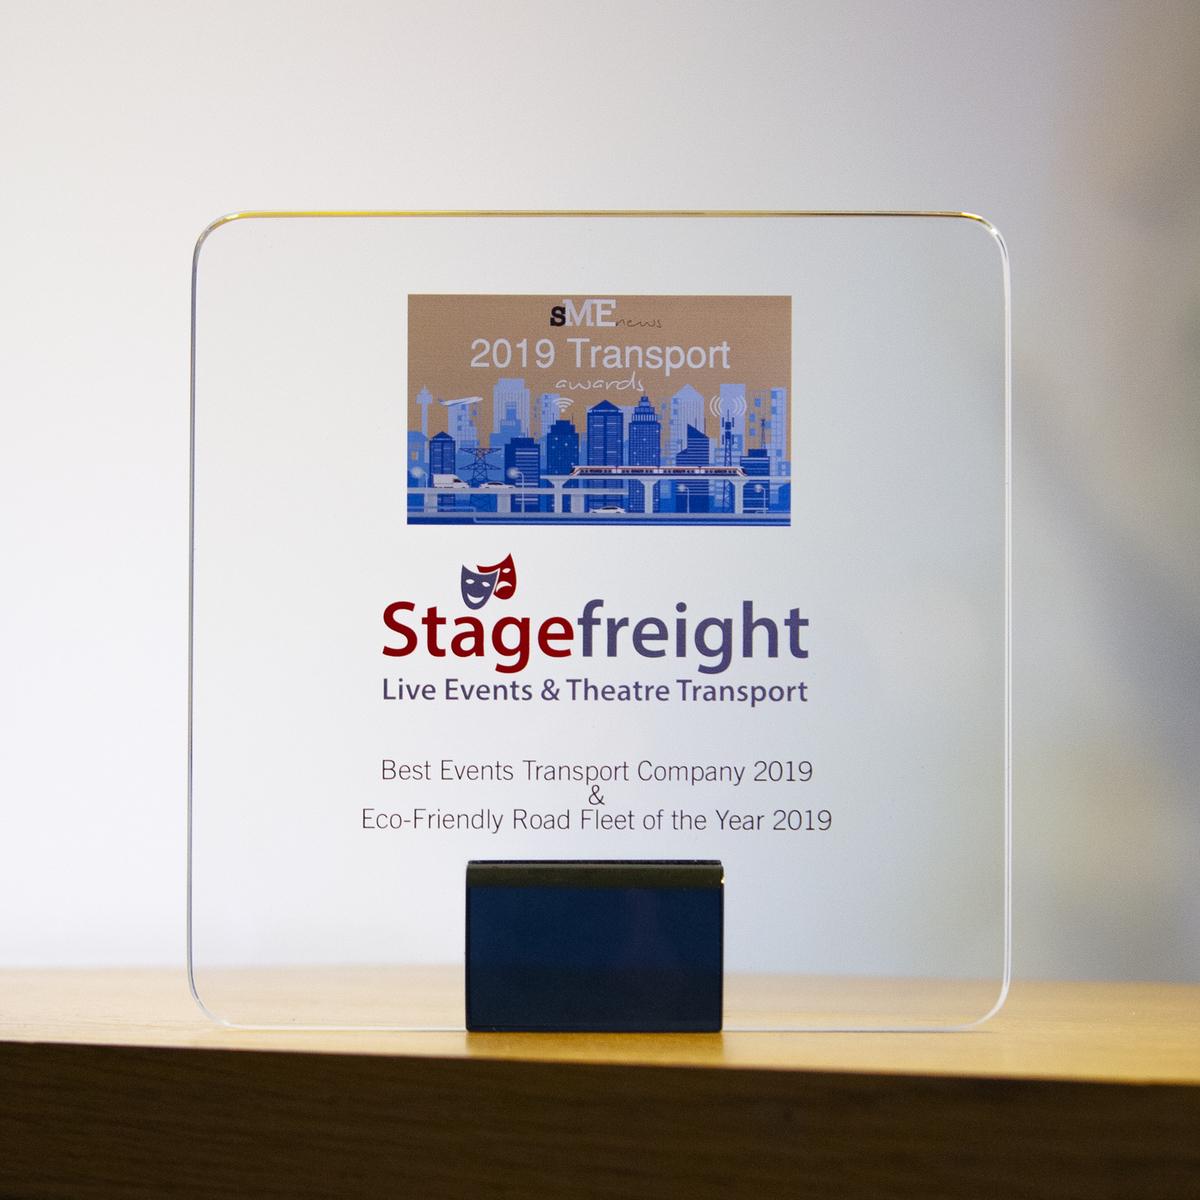 stagefreight award 2019 SME News